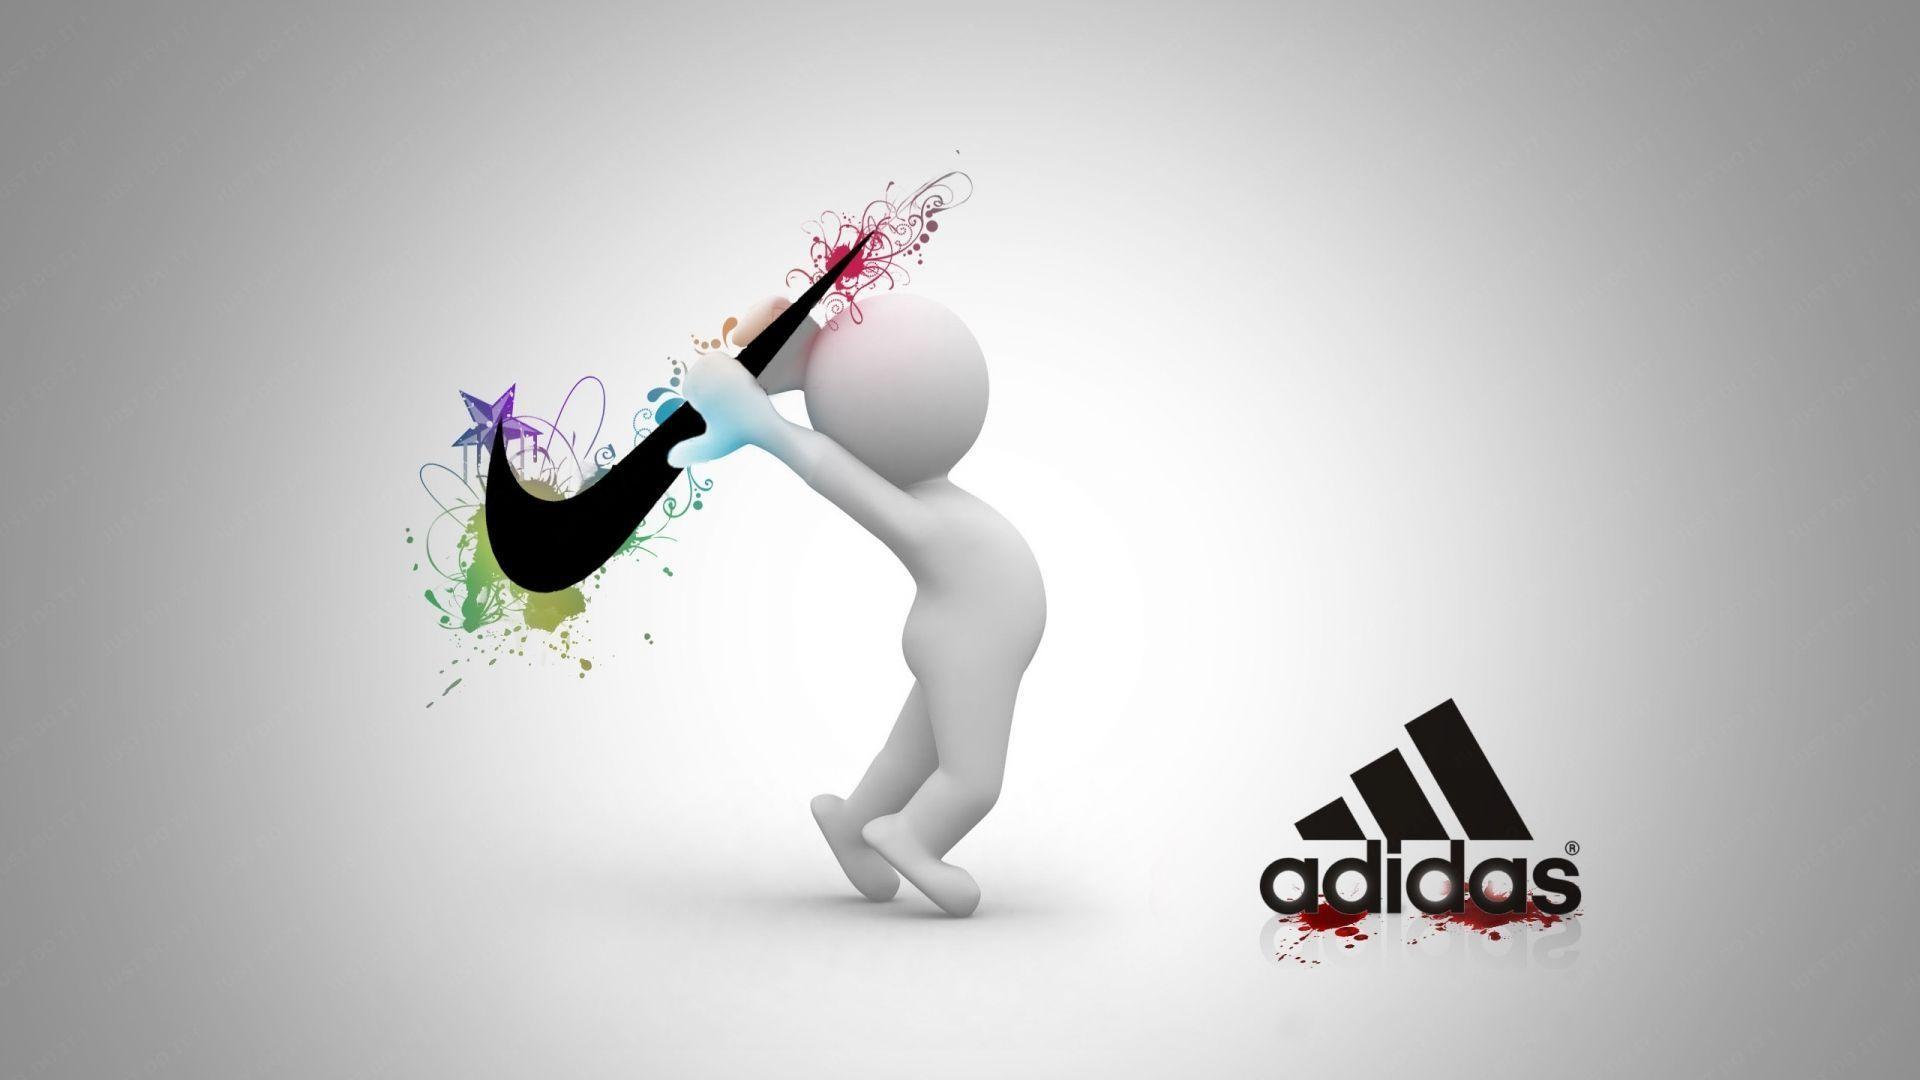 Nike Wallpaper Hd 1080p – Desktop Wallpaper – Desktop Wallpaper